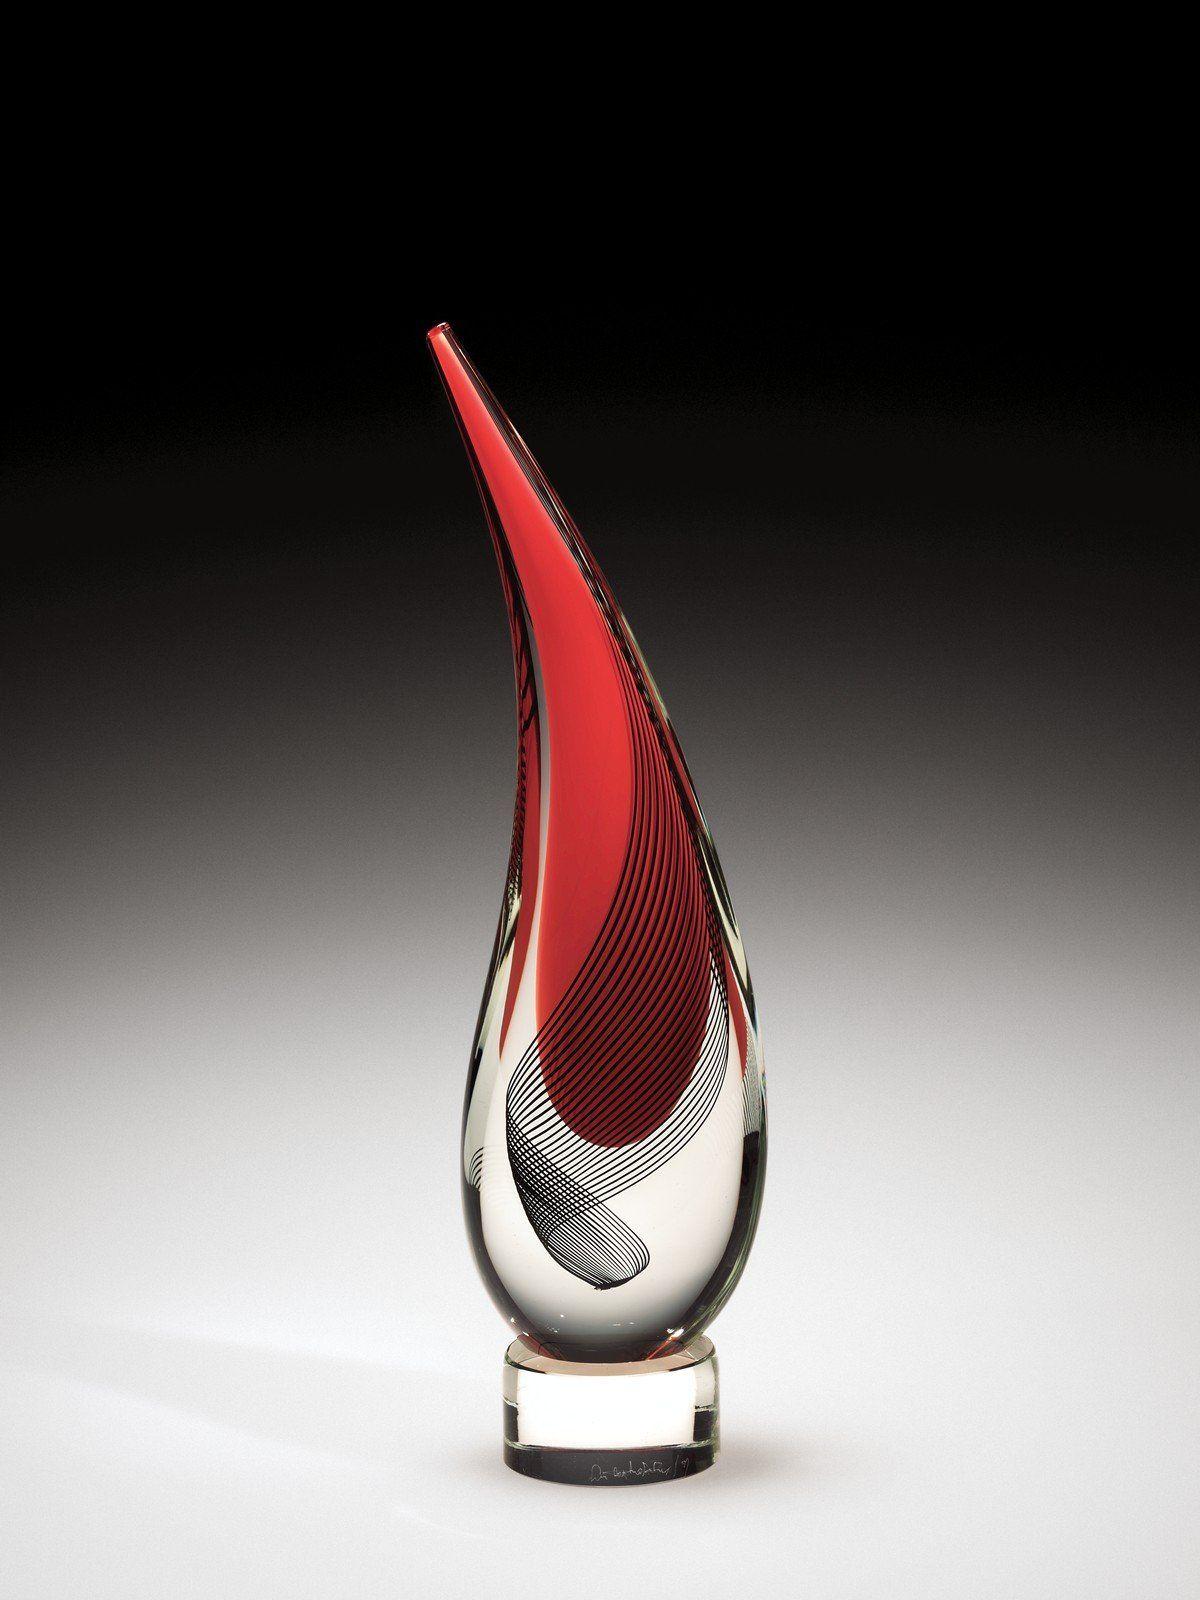 Lacrima I Lino Tagliapietra Seattle Washington United States 1991 Gift Of The Ben W Heineman Sr F Corning Museum Of Glass Glass Art Sculpture Glass Art